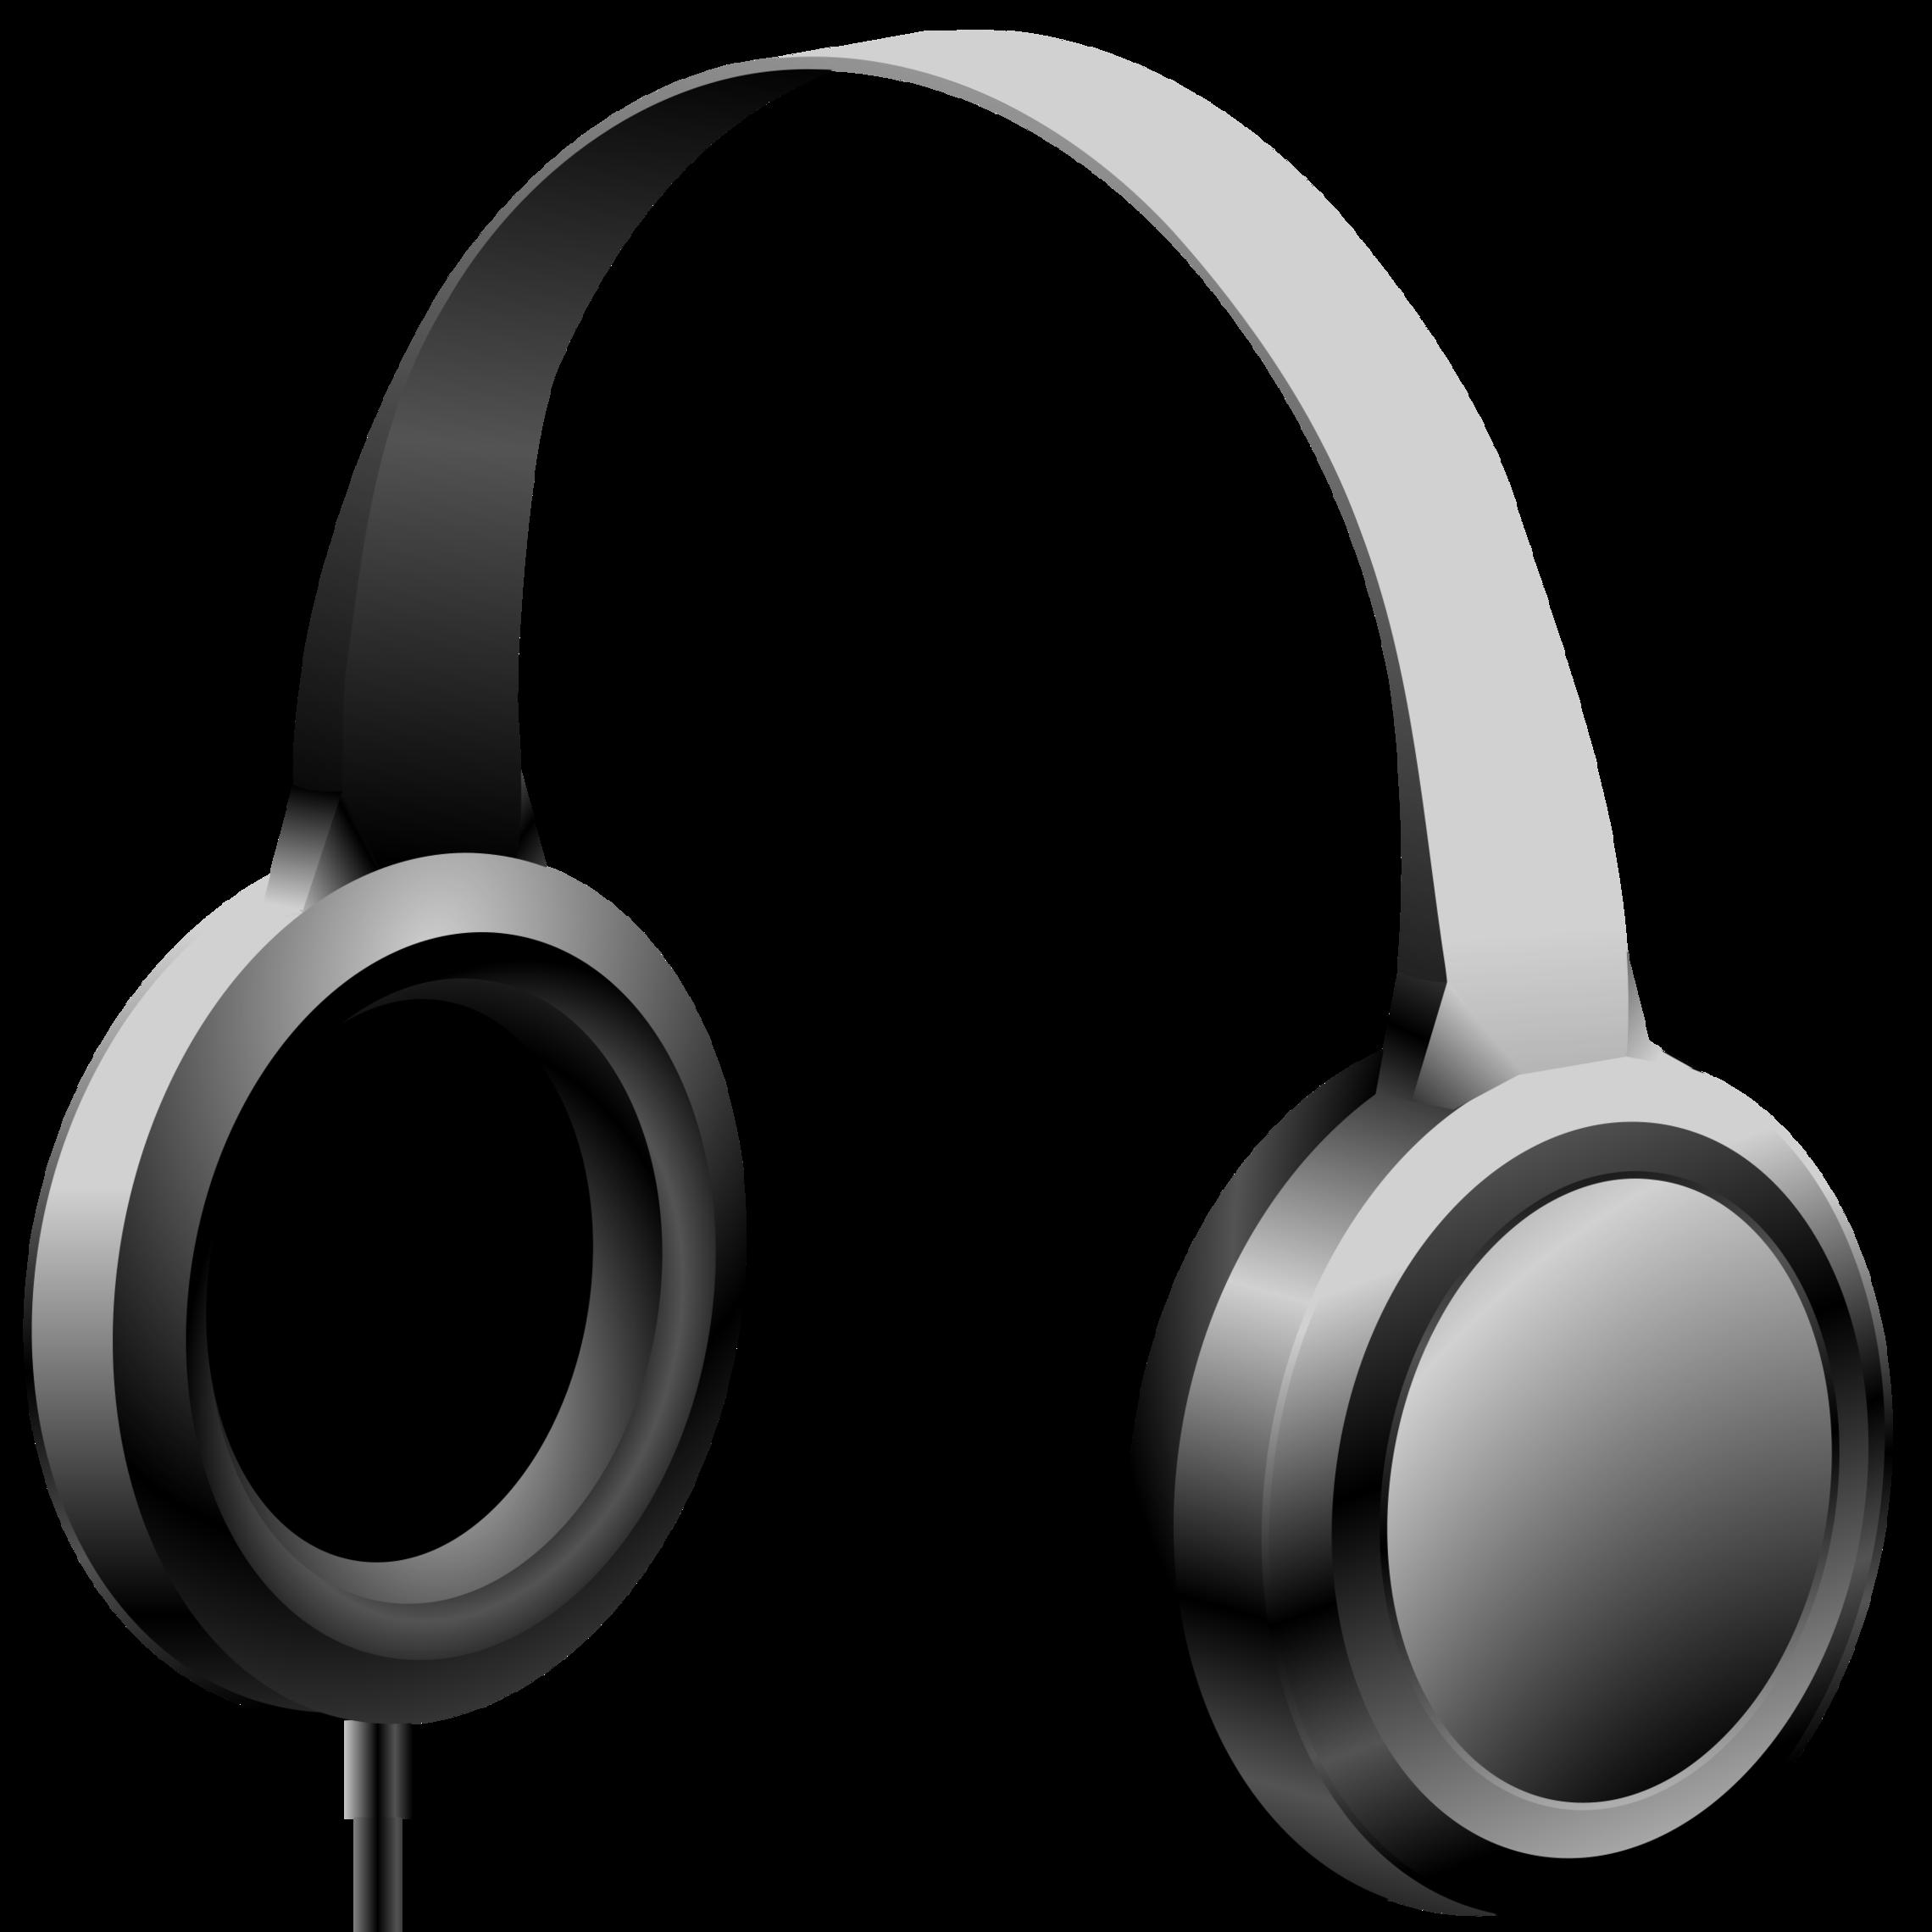 Headphones Drawing - ClipArt Best